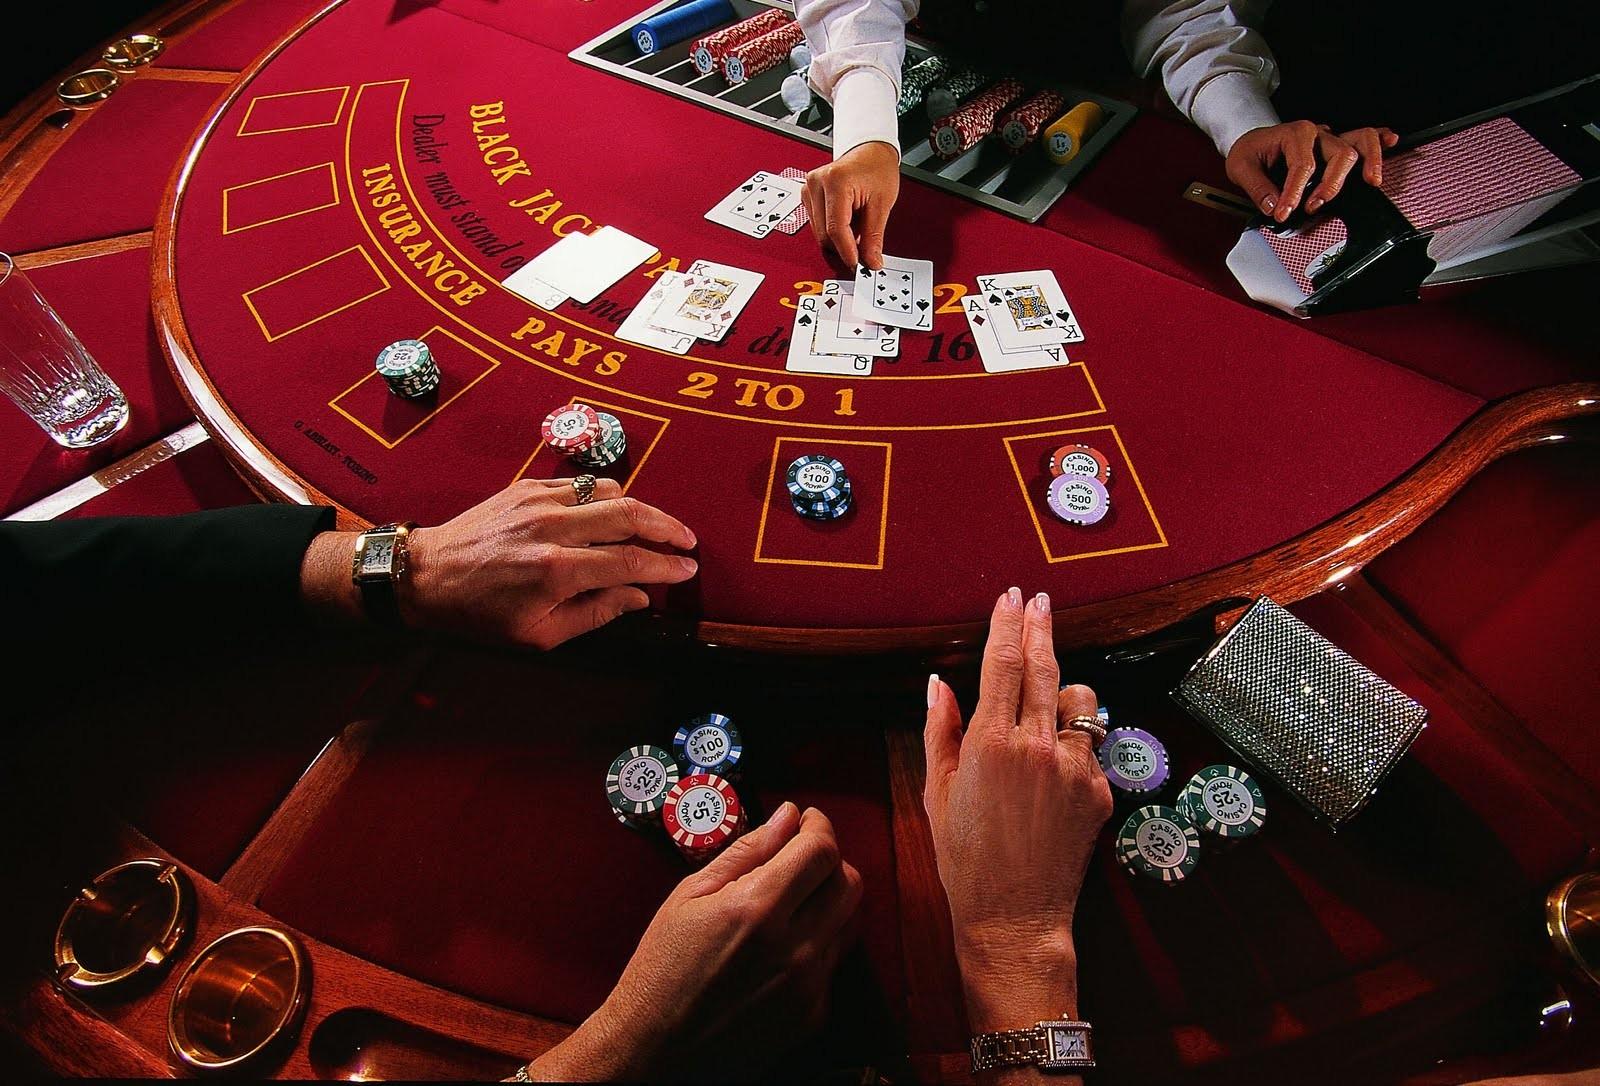 Bandar Judi Online Situs Judi Bola Poker Online Judi Casino Qqjoker Linkedin